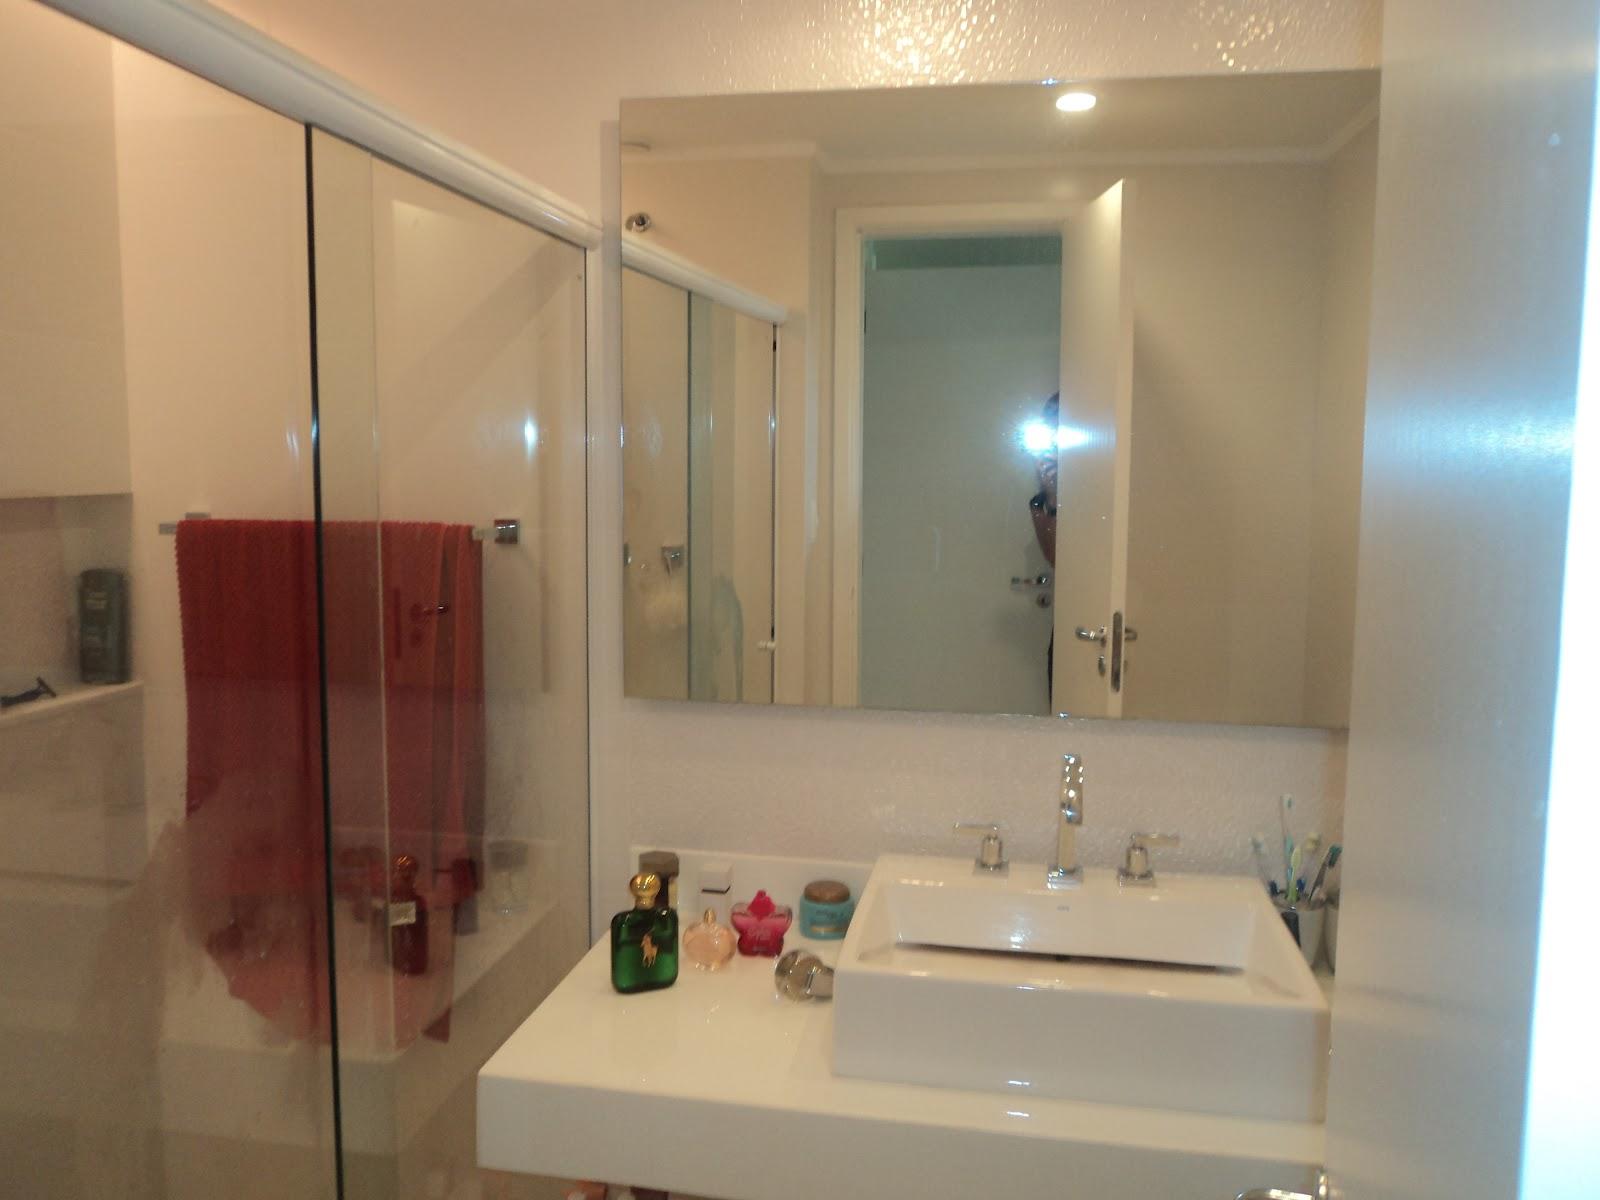 decoracao de interiores para banheiro:Arquitetura e Design de Interiores: Decoração Banheiro